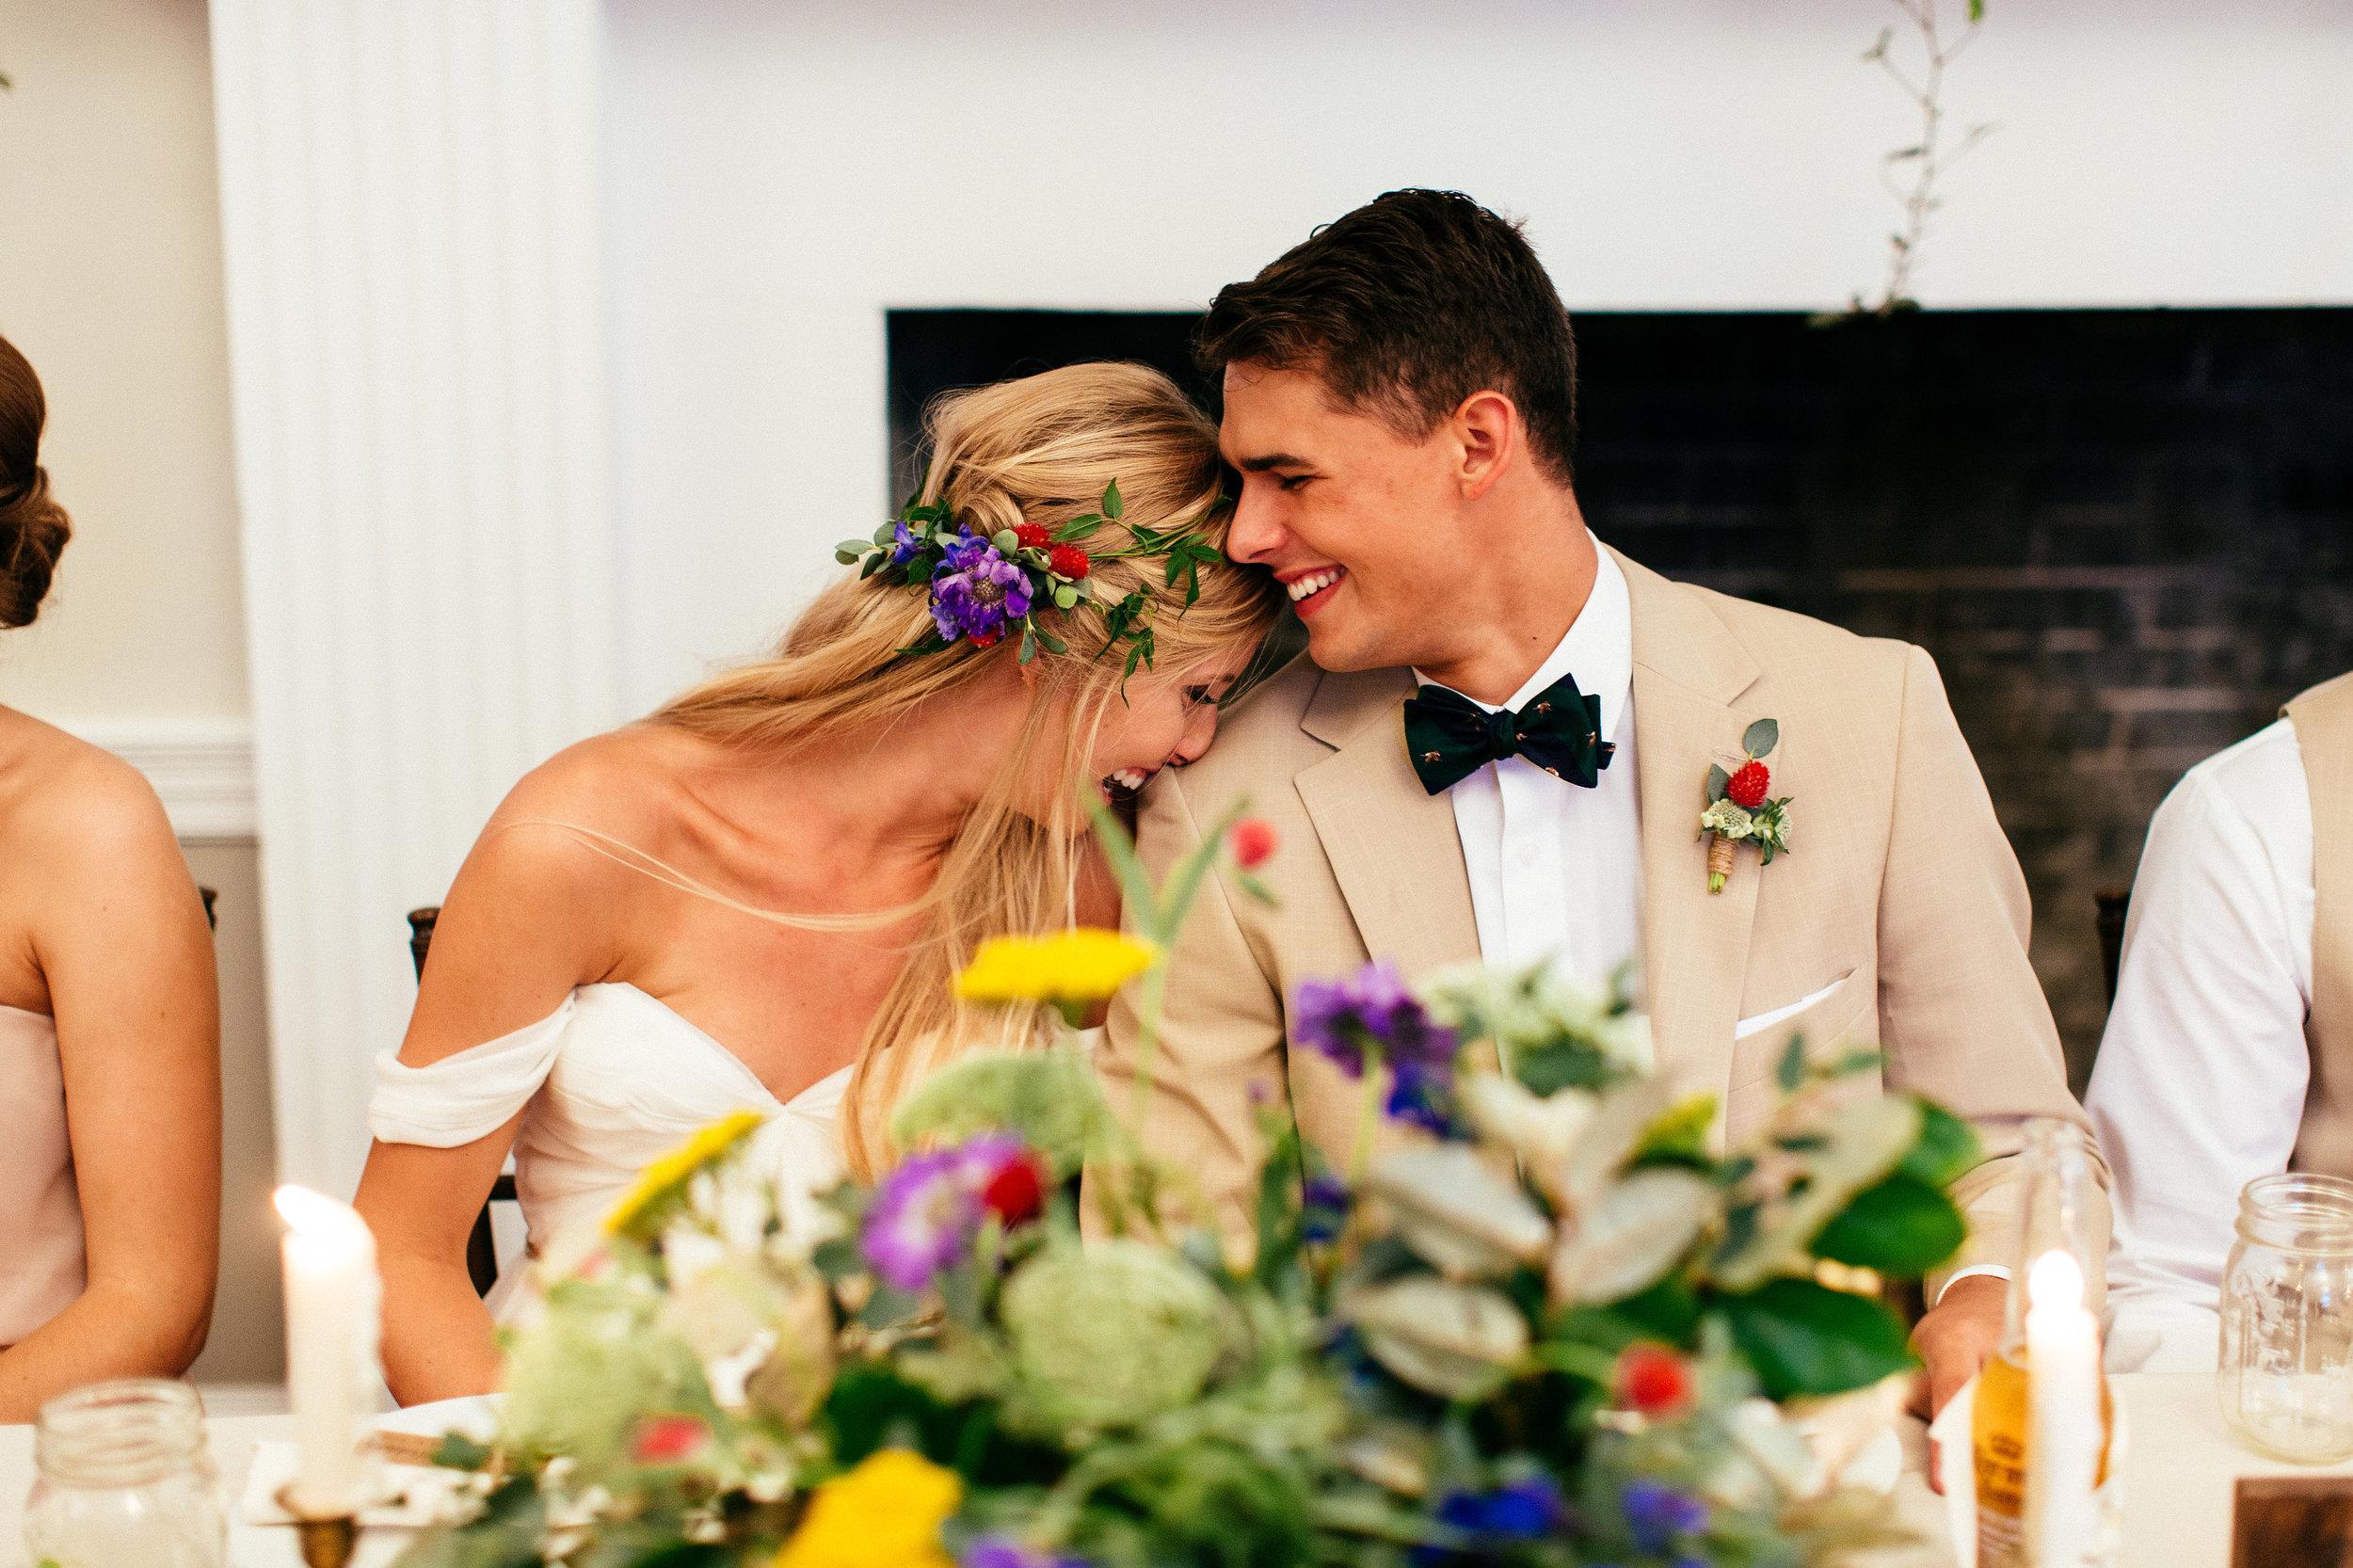 christina-karst-photography-ivory-and-beau-bridal-boutique-sarah-seven-lafayette-boho-bride-boho-bridal-boutique-indie-bridal-boutique-savannah-bridal-boutique-savannah-wedding-dresses-savannah-bridal-gowns-29.jpg